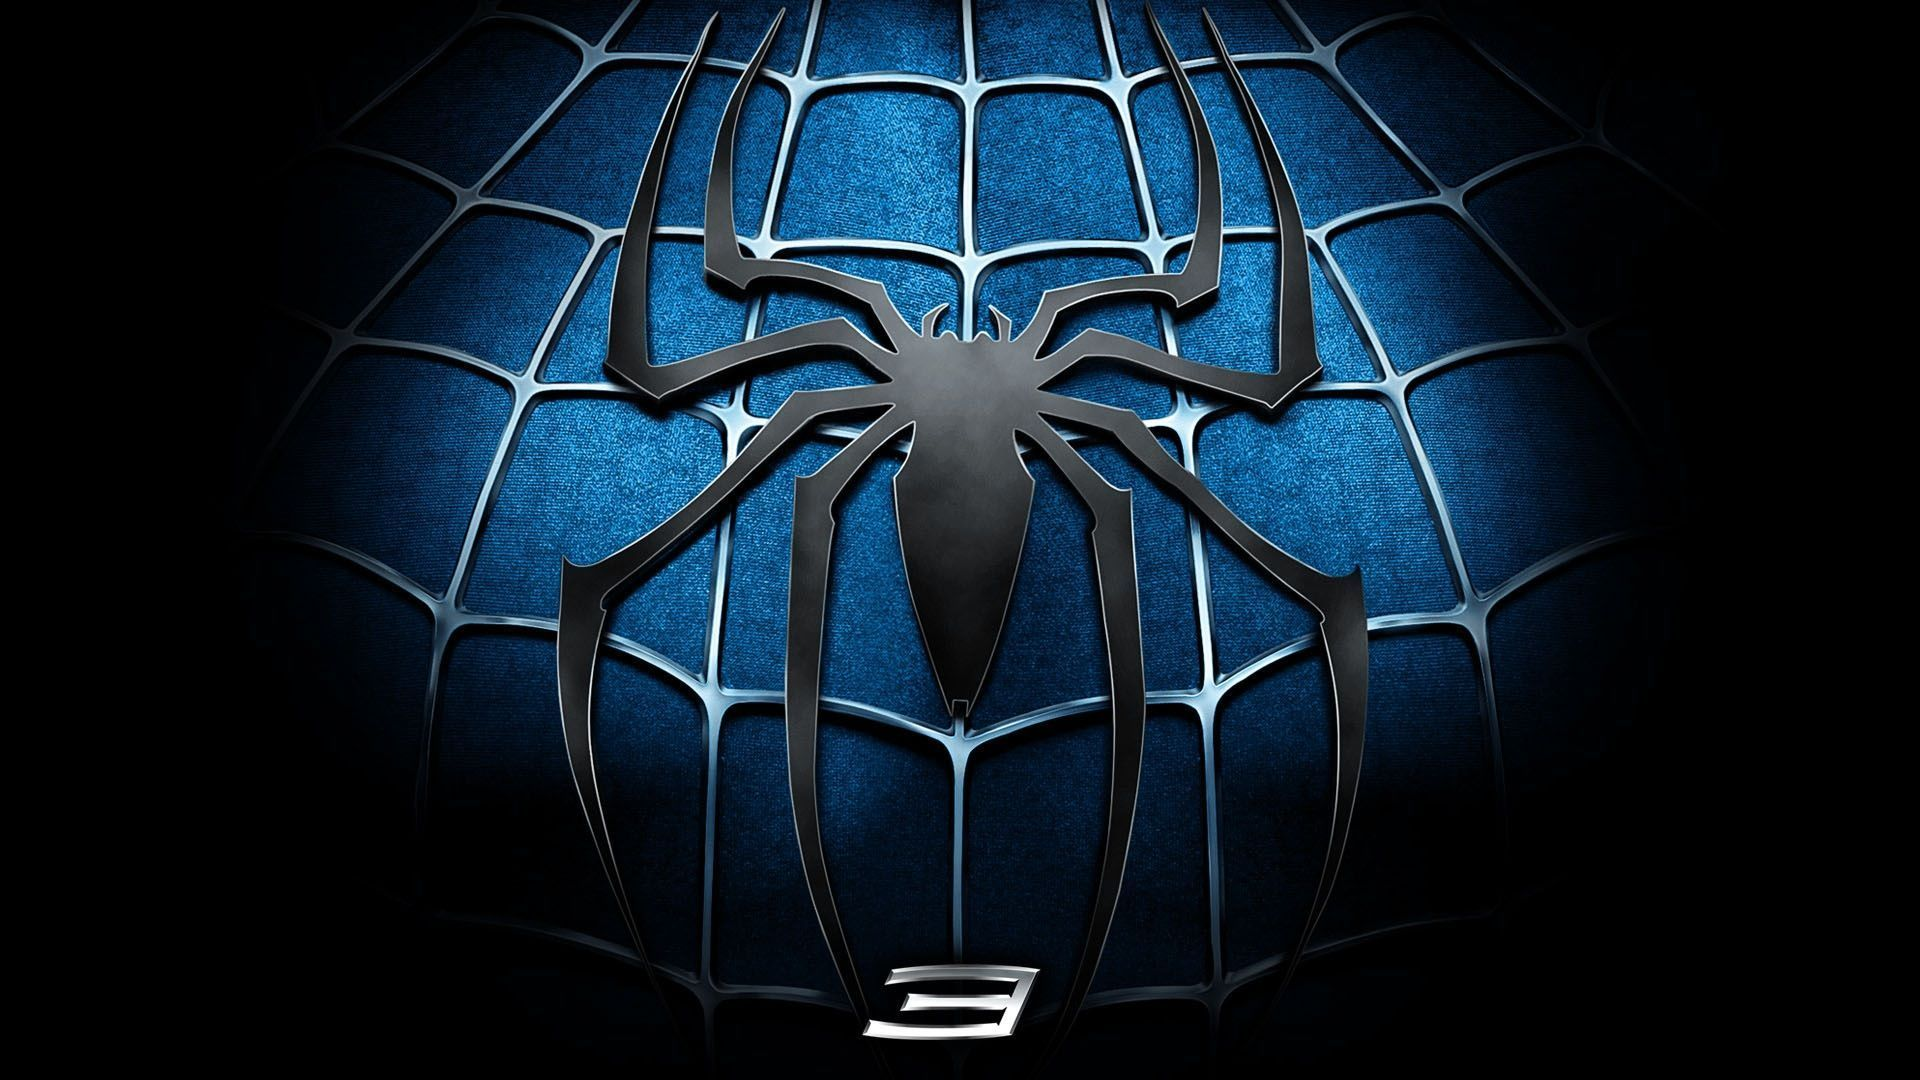 Spider Man Logo Wallpapers Top Free Spider Man Logo